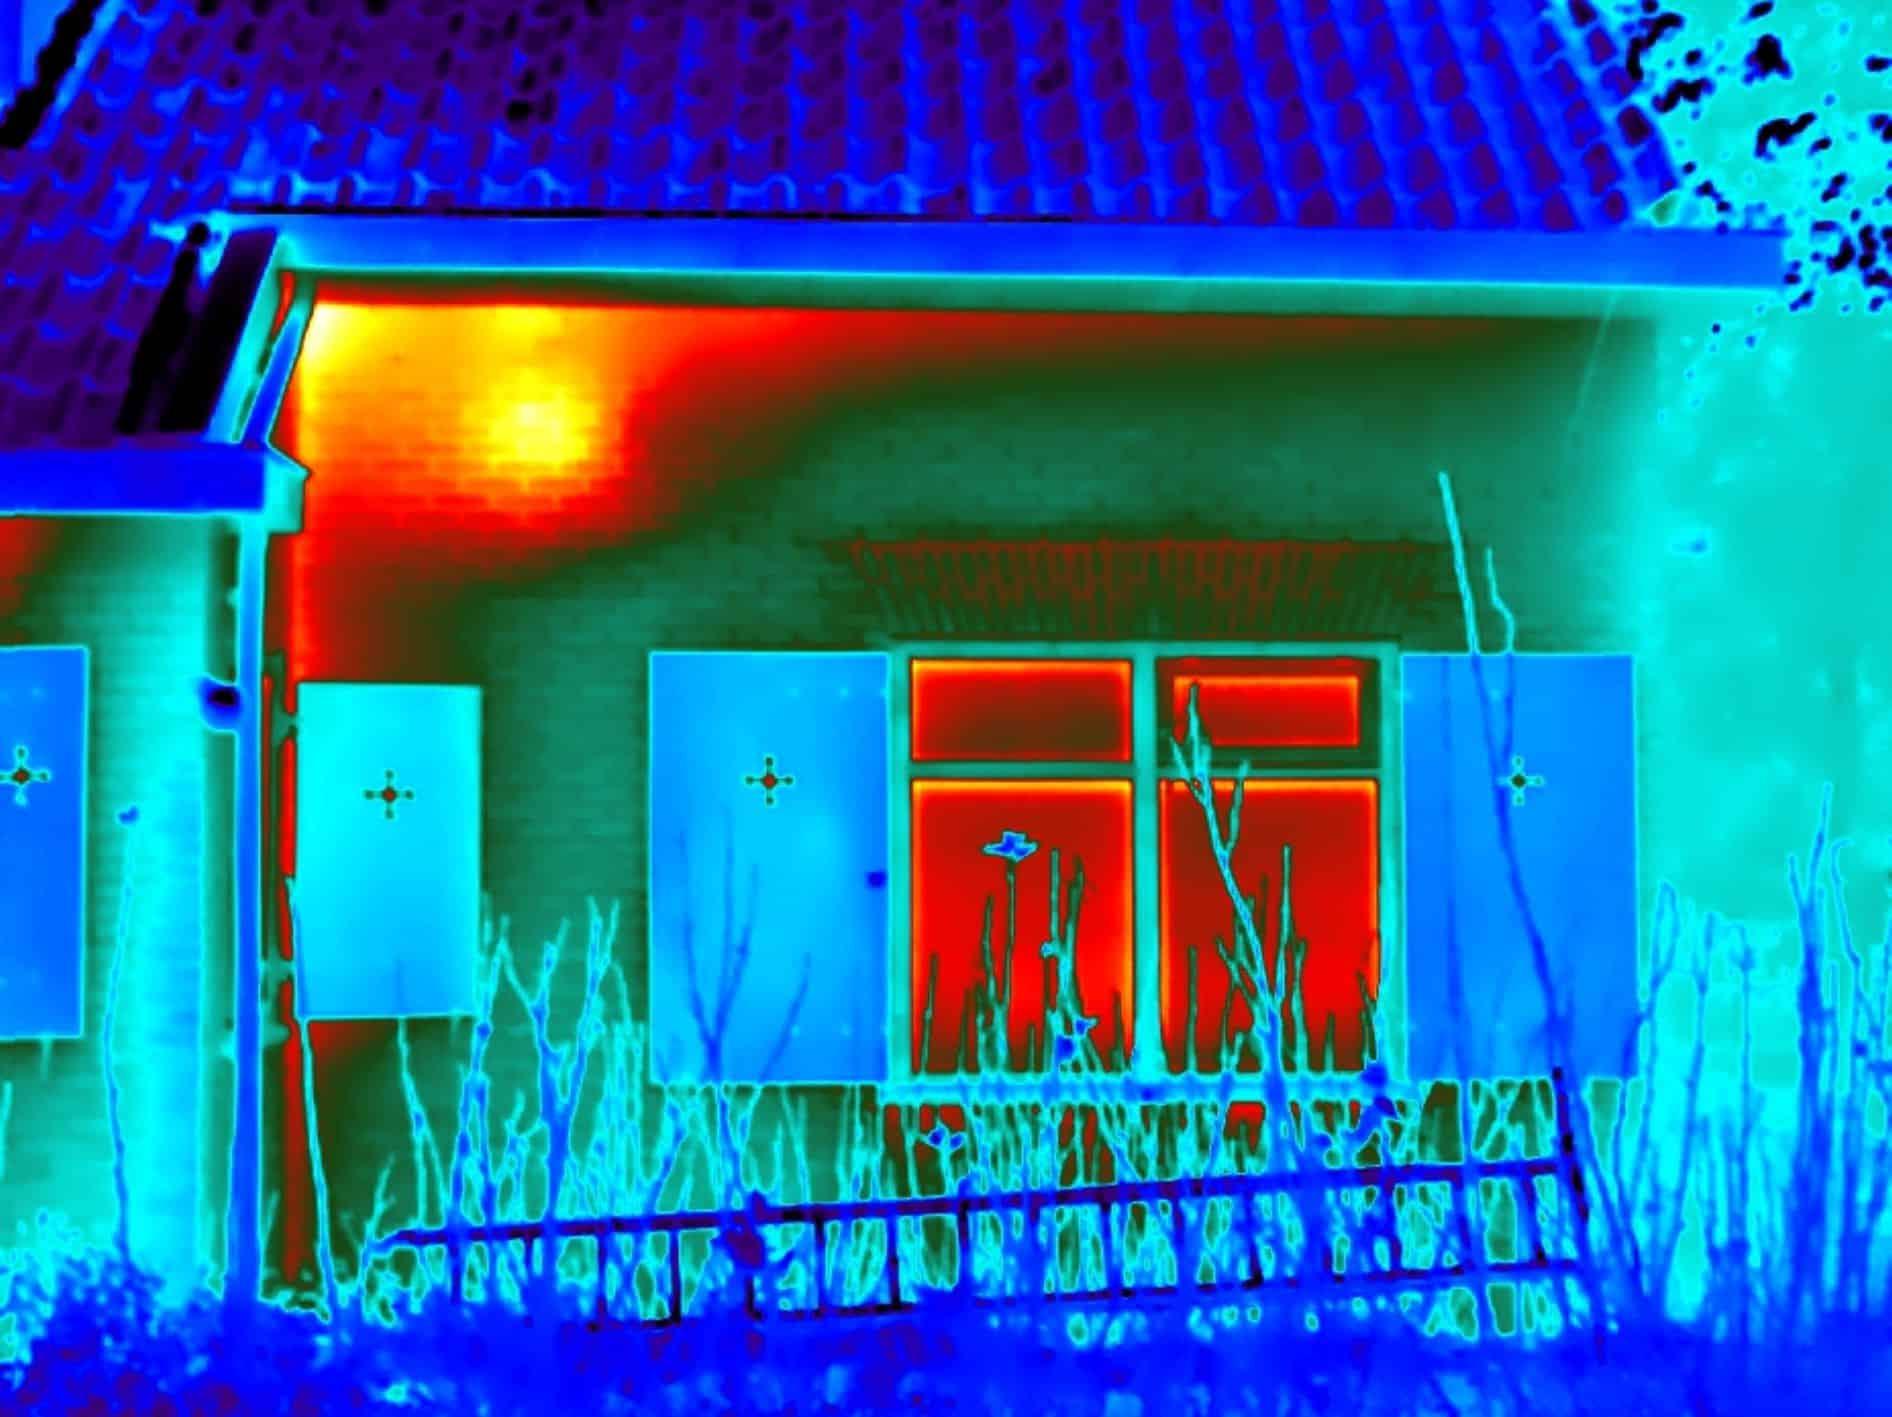 Woning thermografie of gebouw thermografie